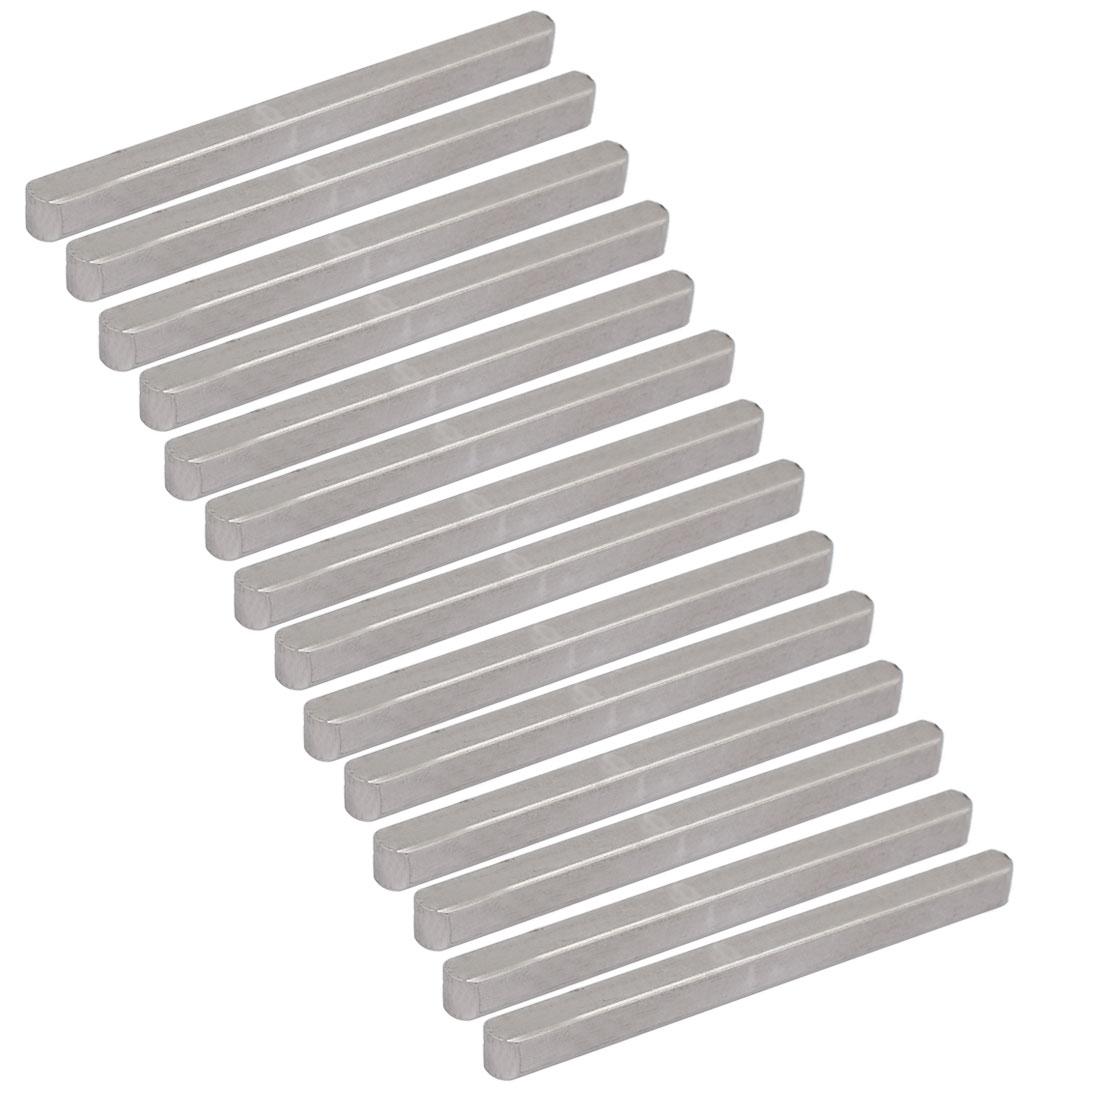 80mmx6mmx6mm Carbon Steel Key Stock To Lock Pulleys 14pcs